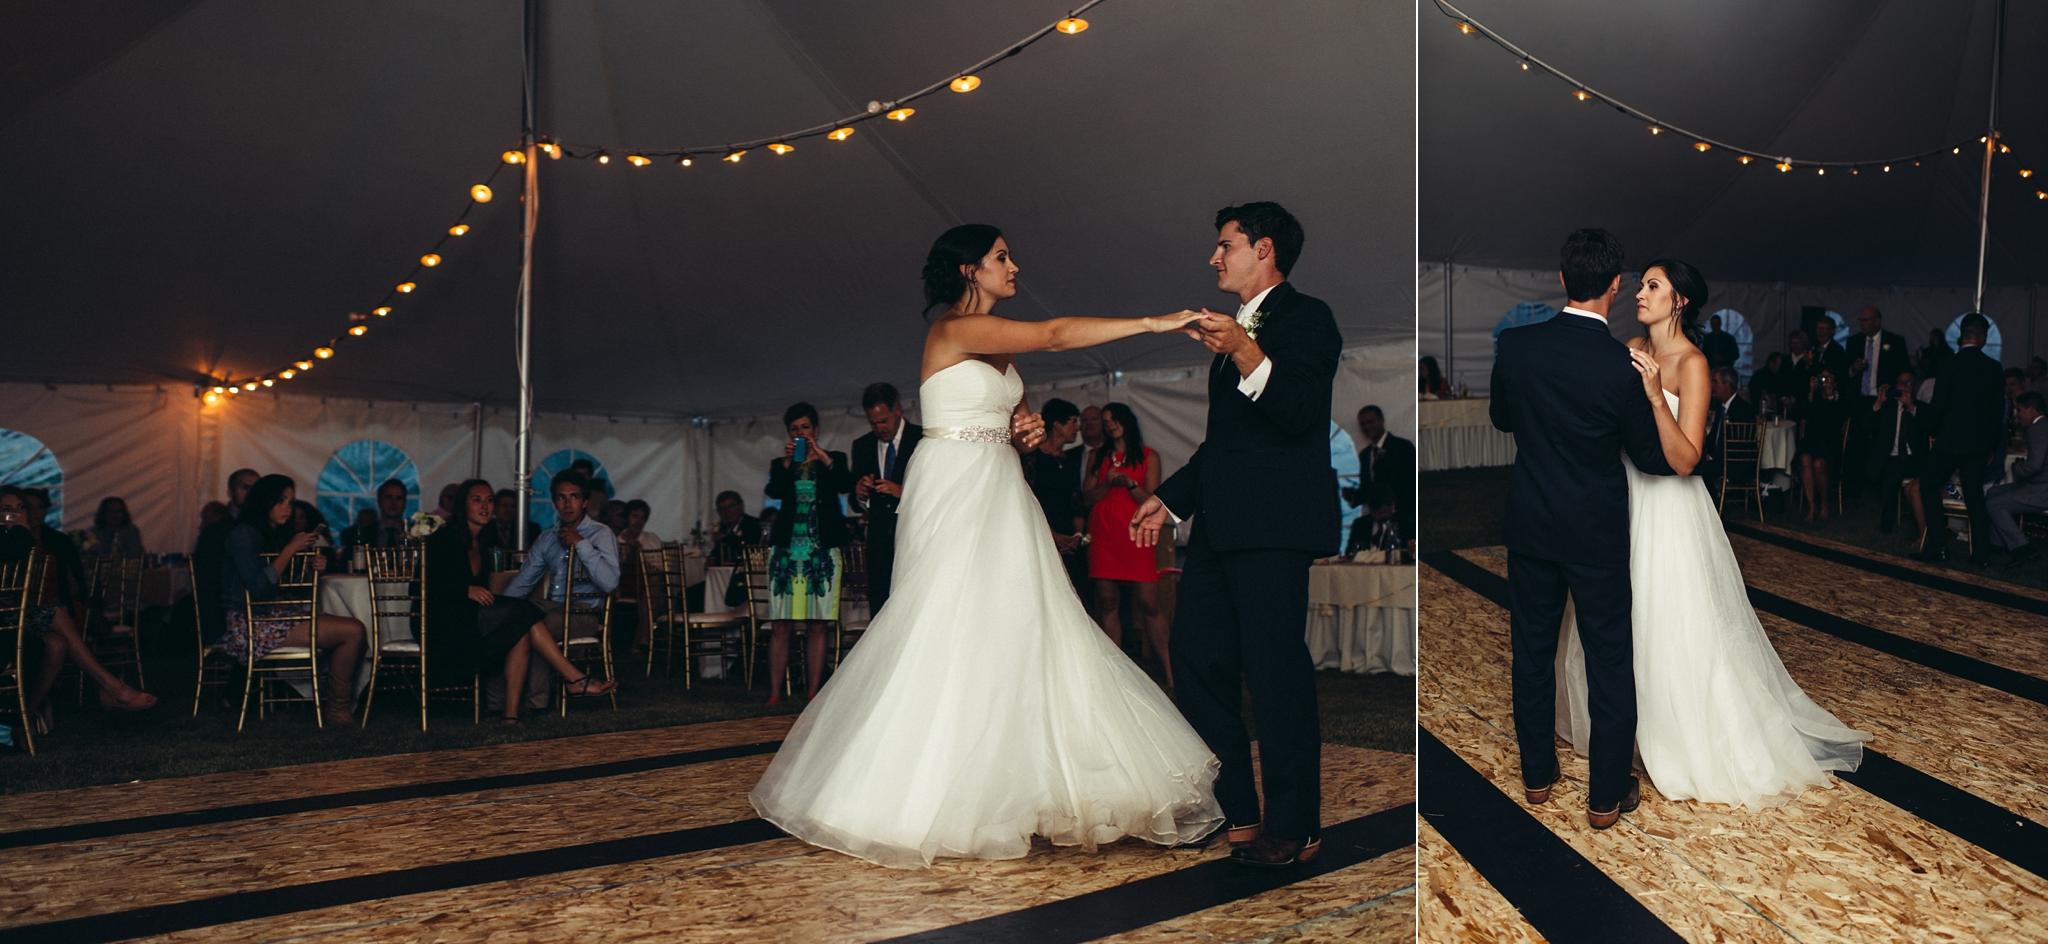 kaihla_tonai_intimate_wedding_elopement_photographer_0077